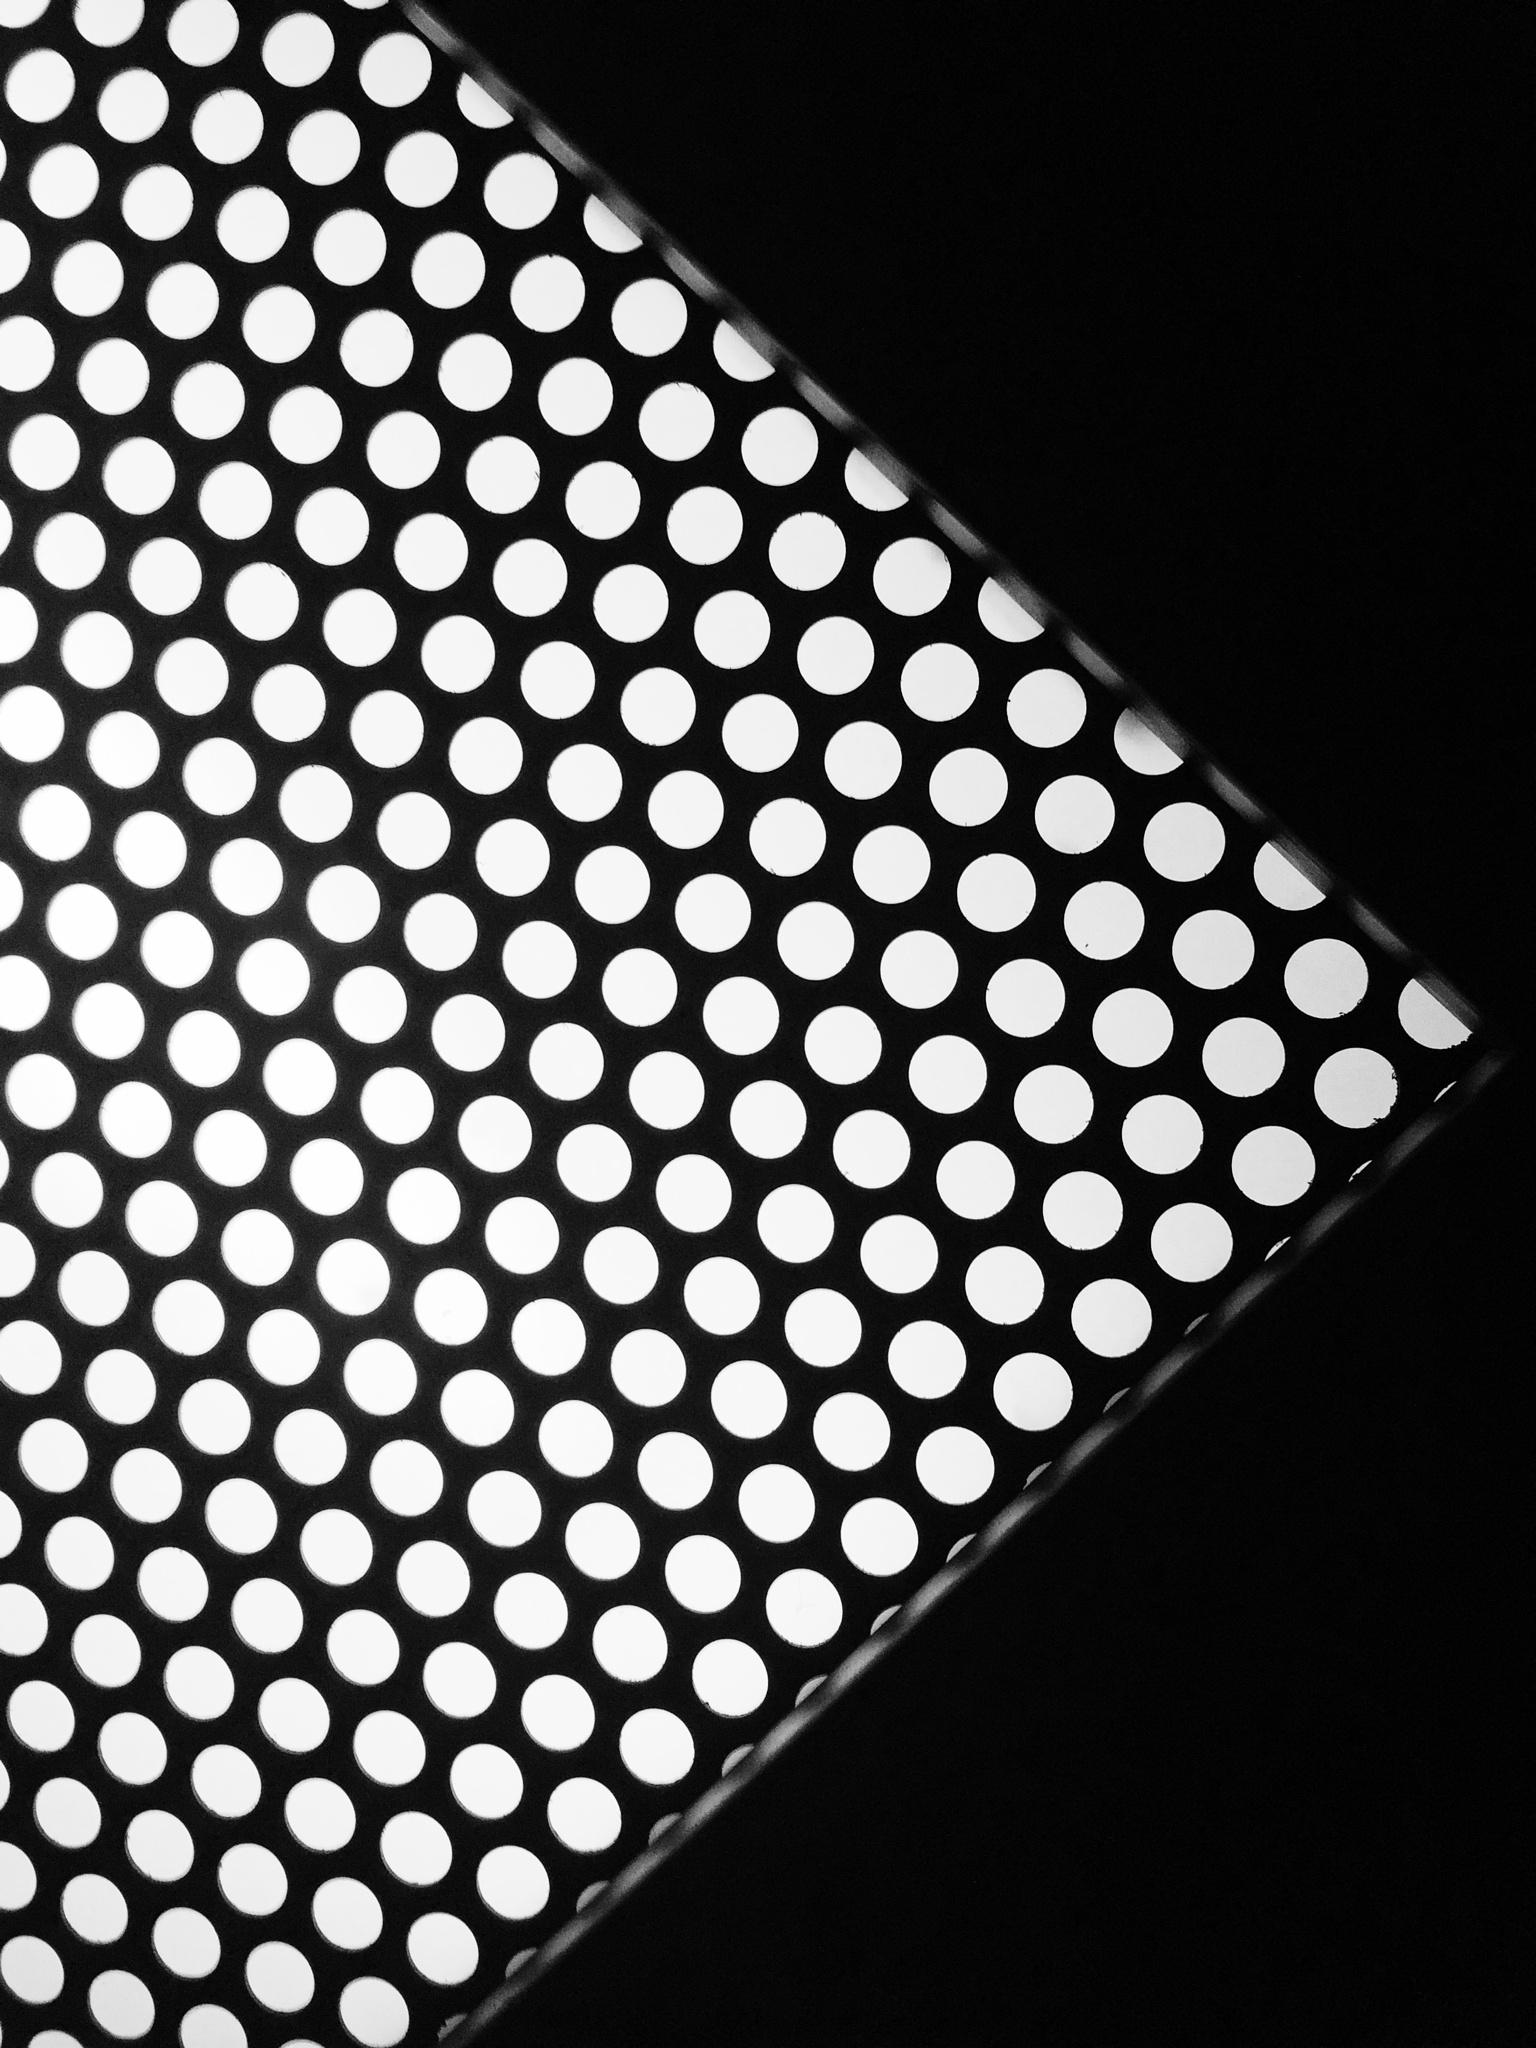 White holes by DanyParodi